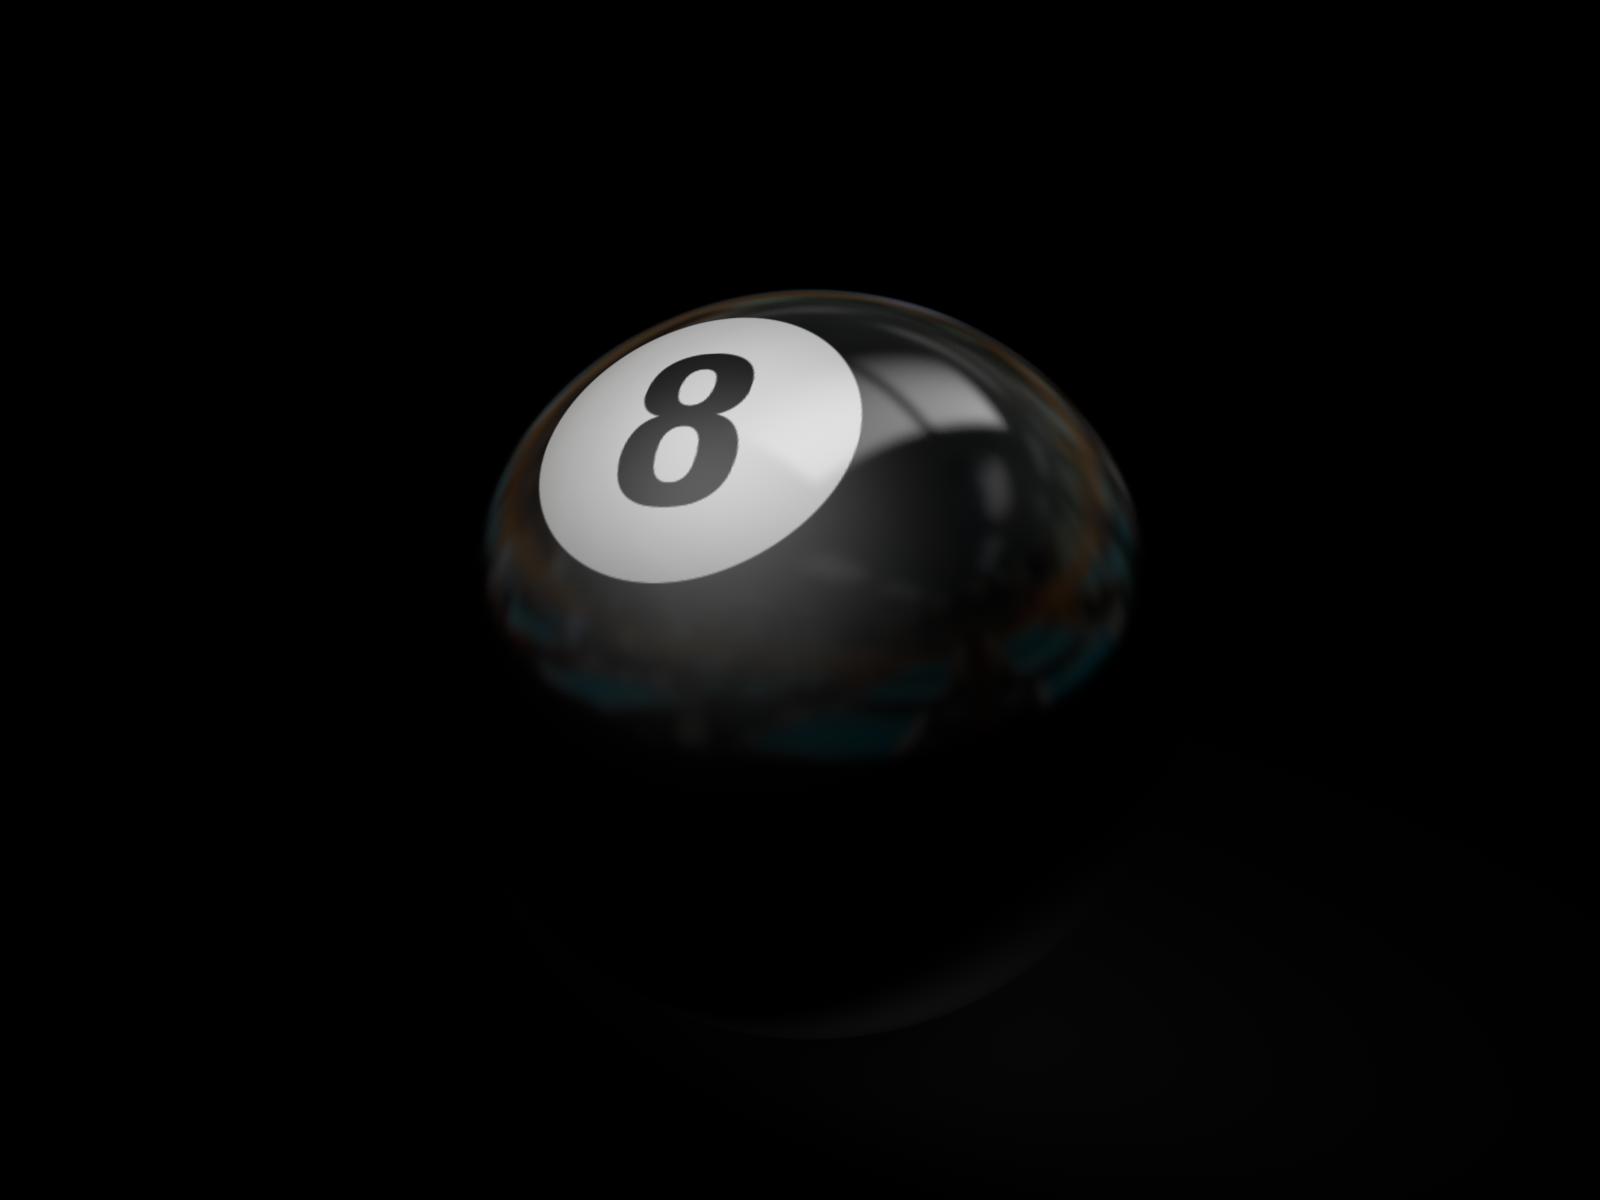 8 ball pool hack ios download free pc